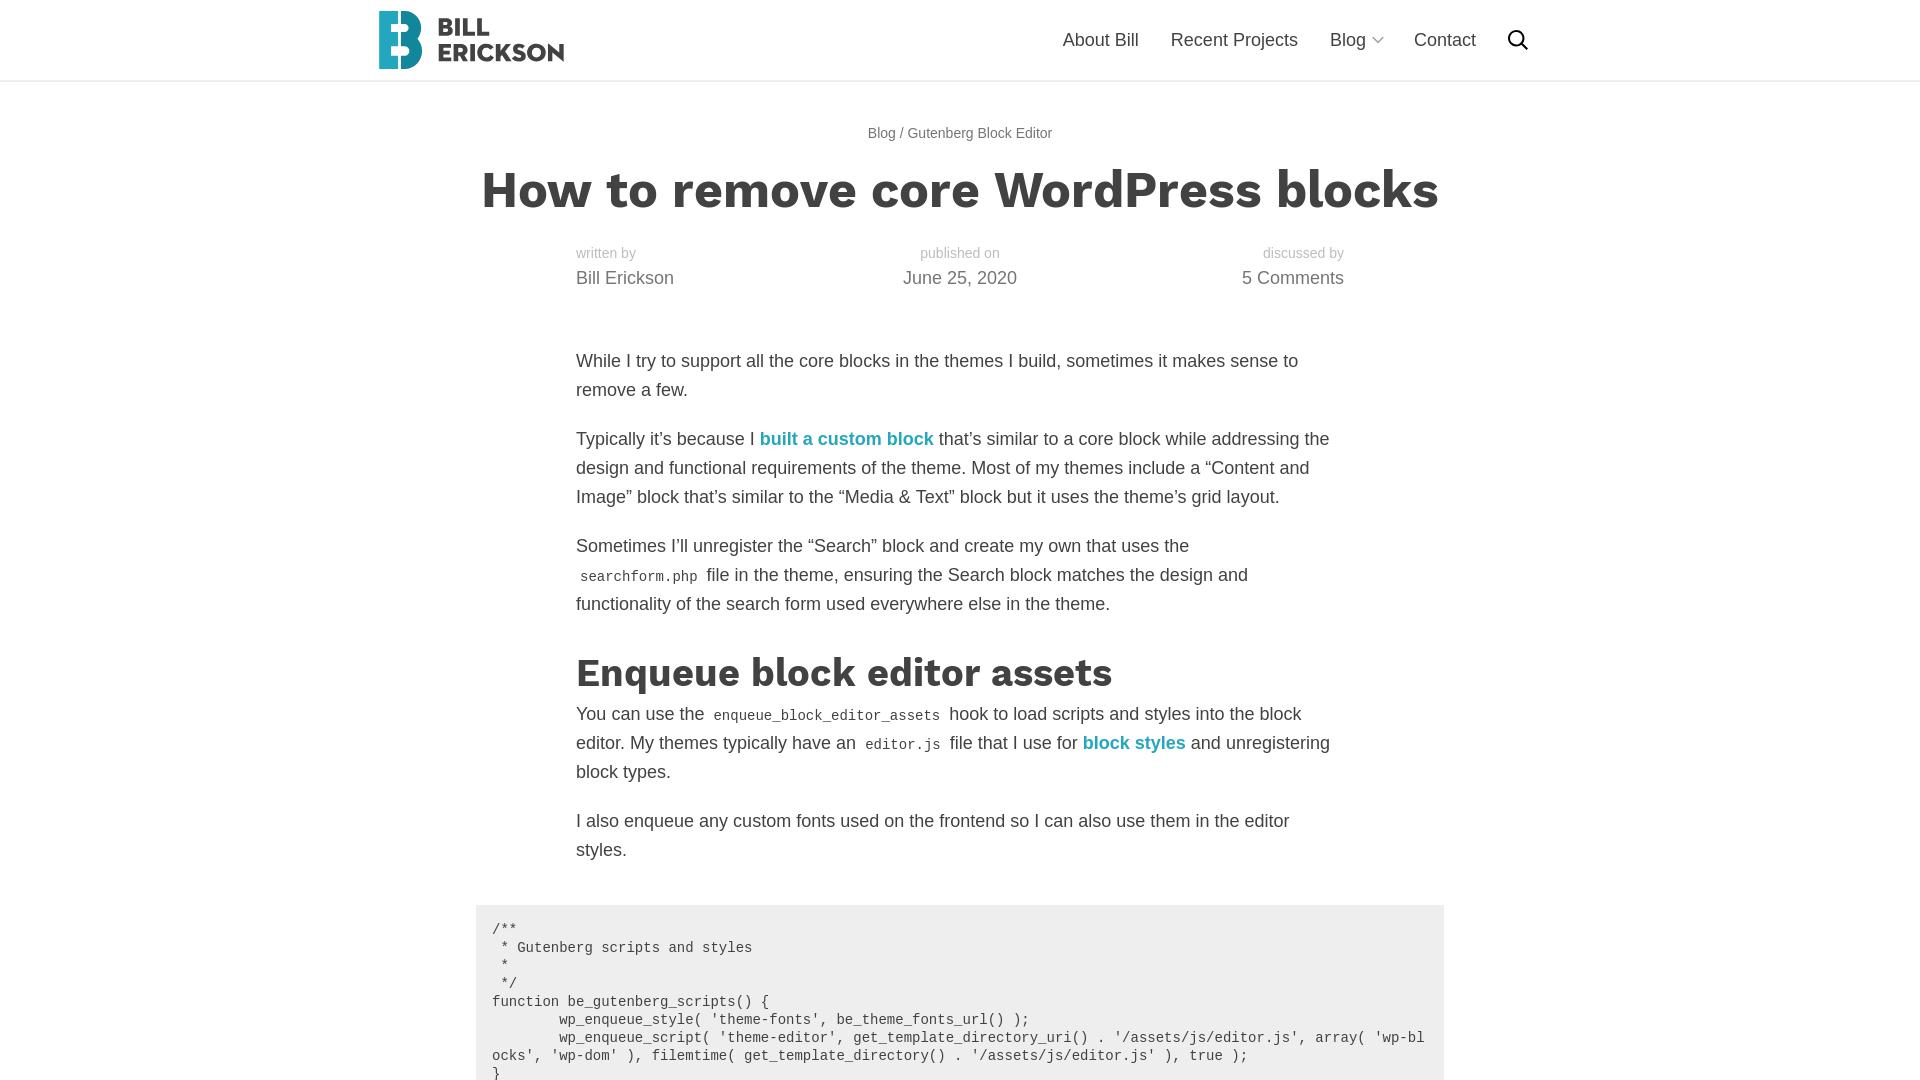 https://www.billerickson.net/how-to-remove-core-wordpress-blocks/